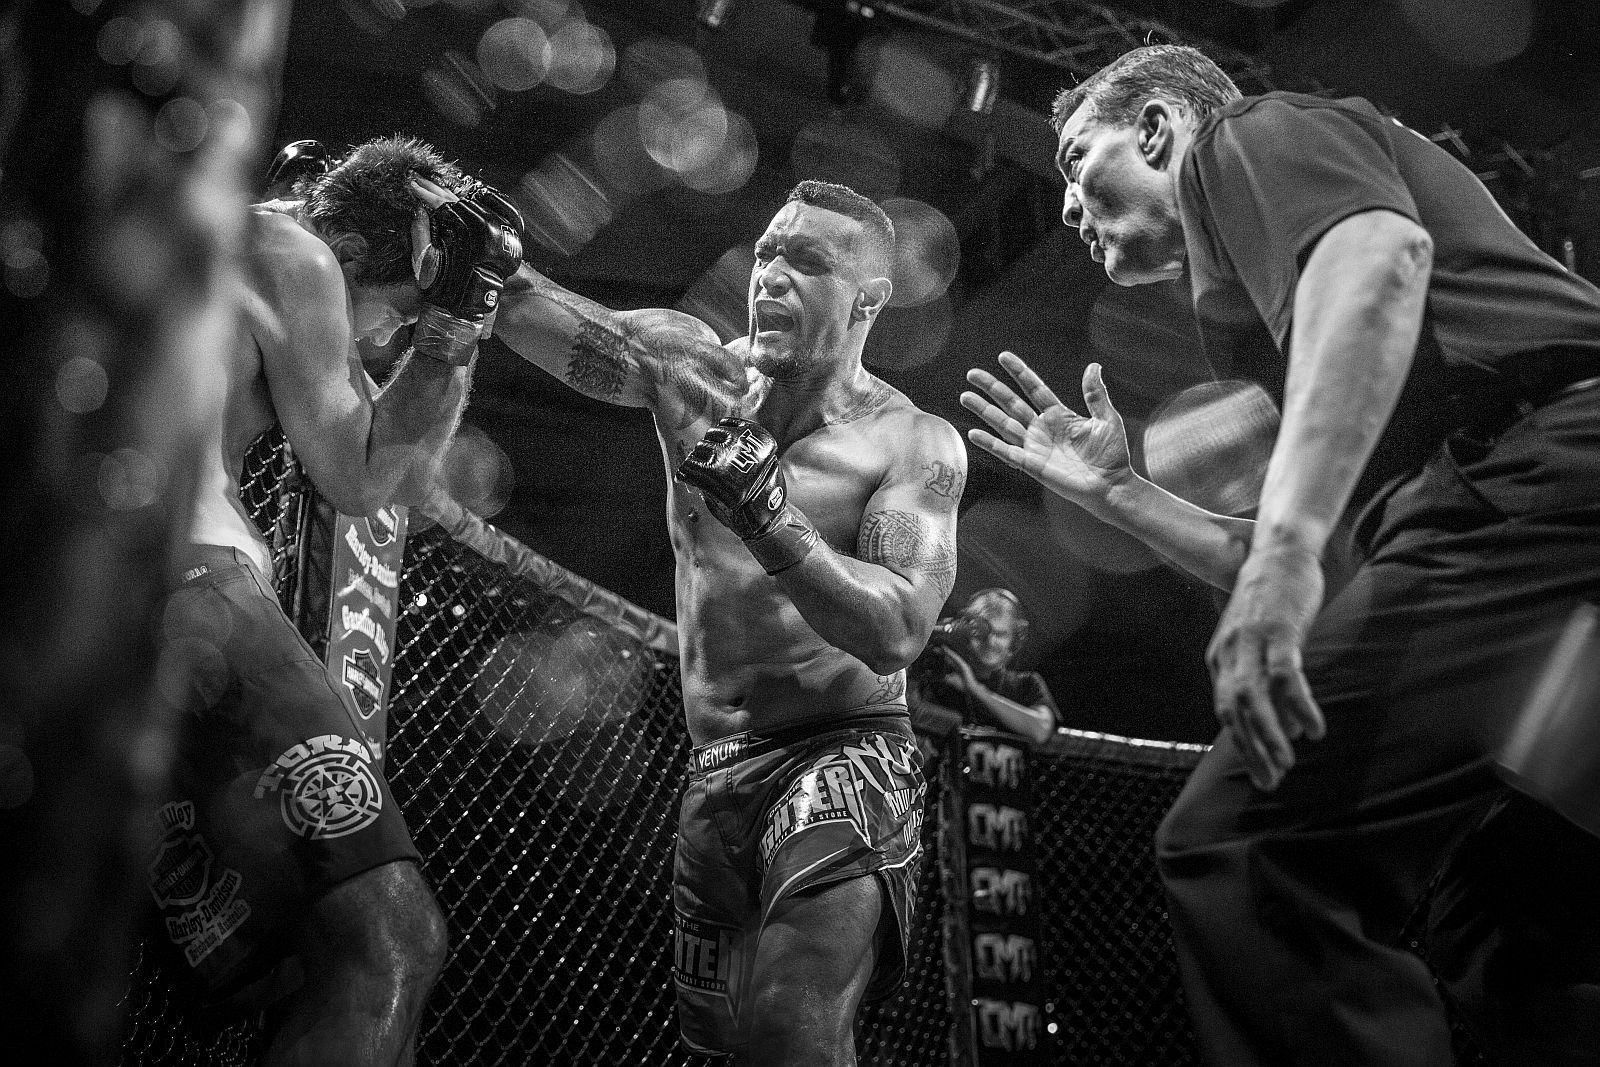 «Боксёр Муай Тай». Третье место в номинации «Editorial Sports». Фото: Matt Palmer